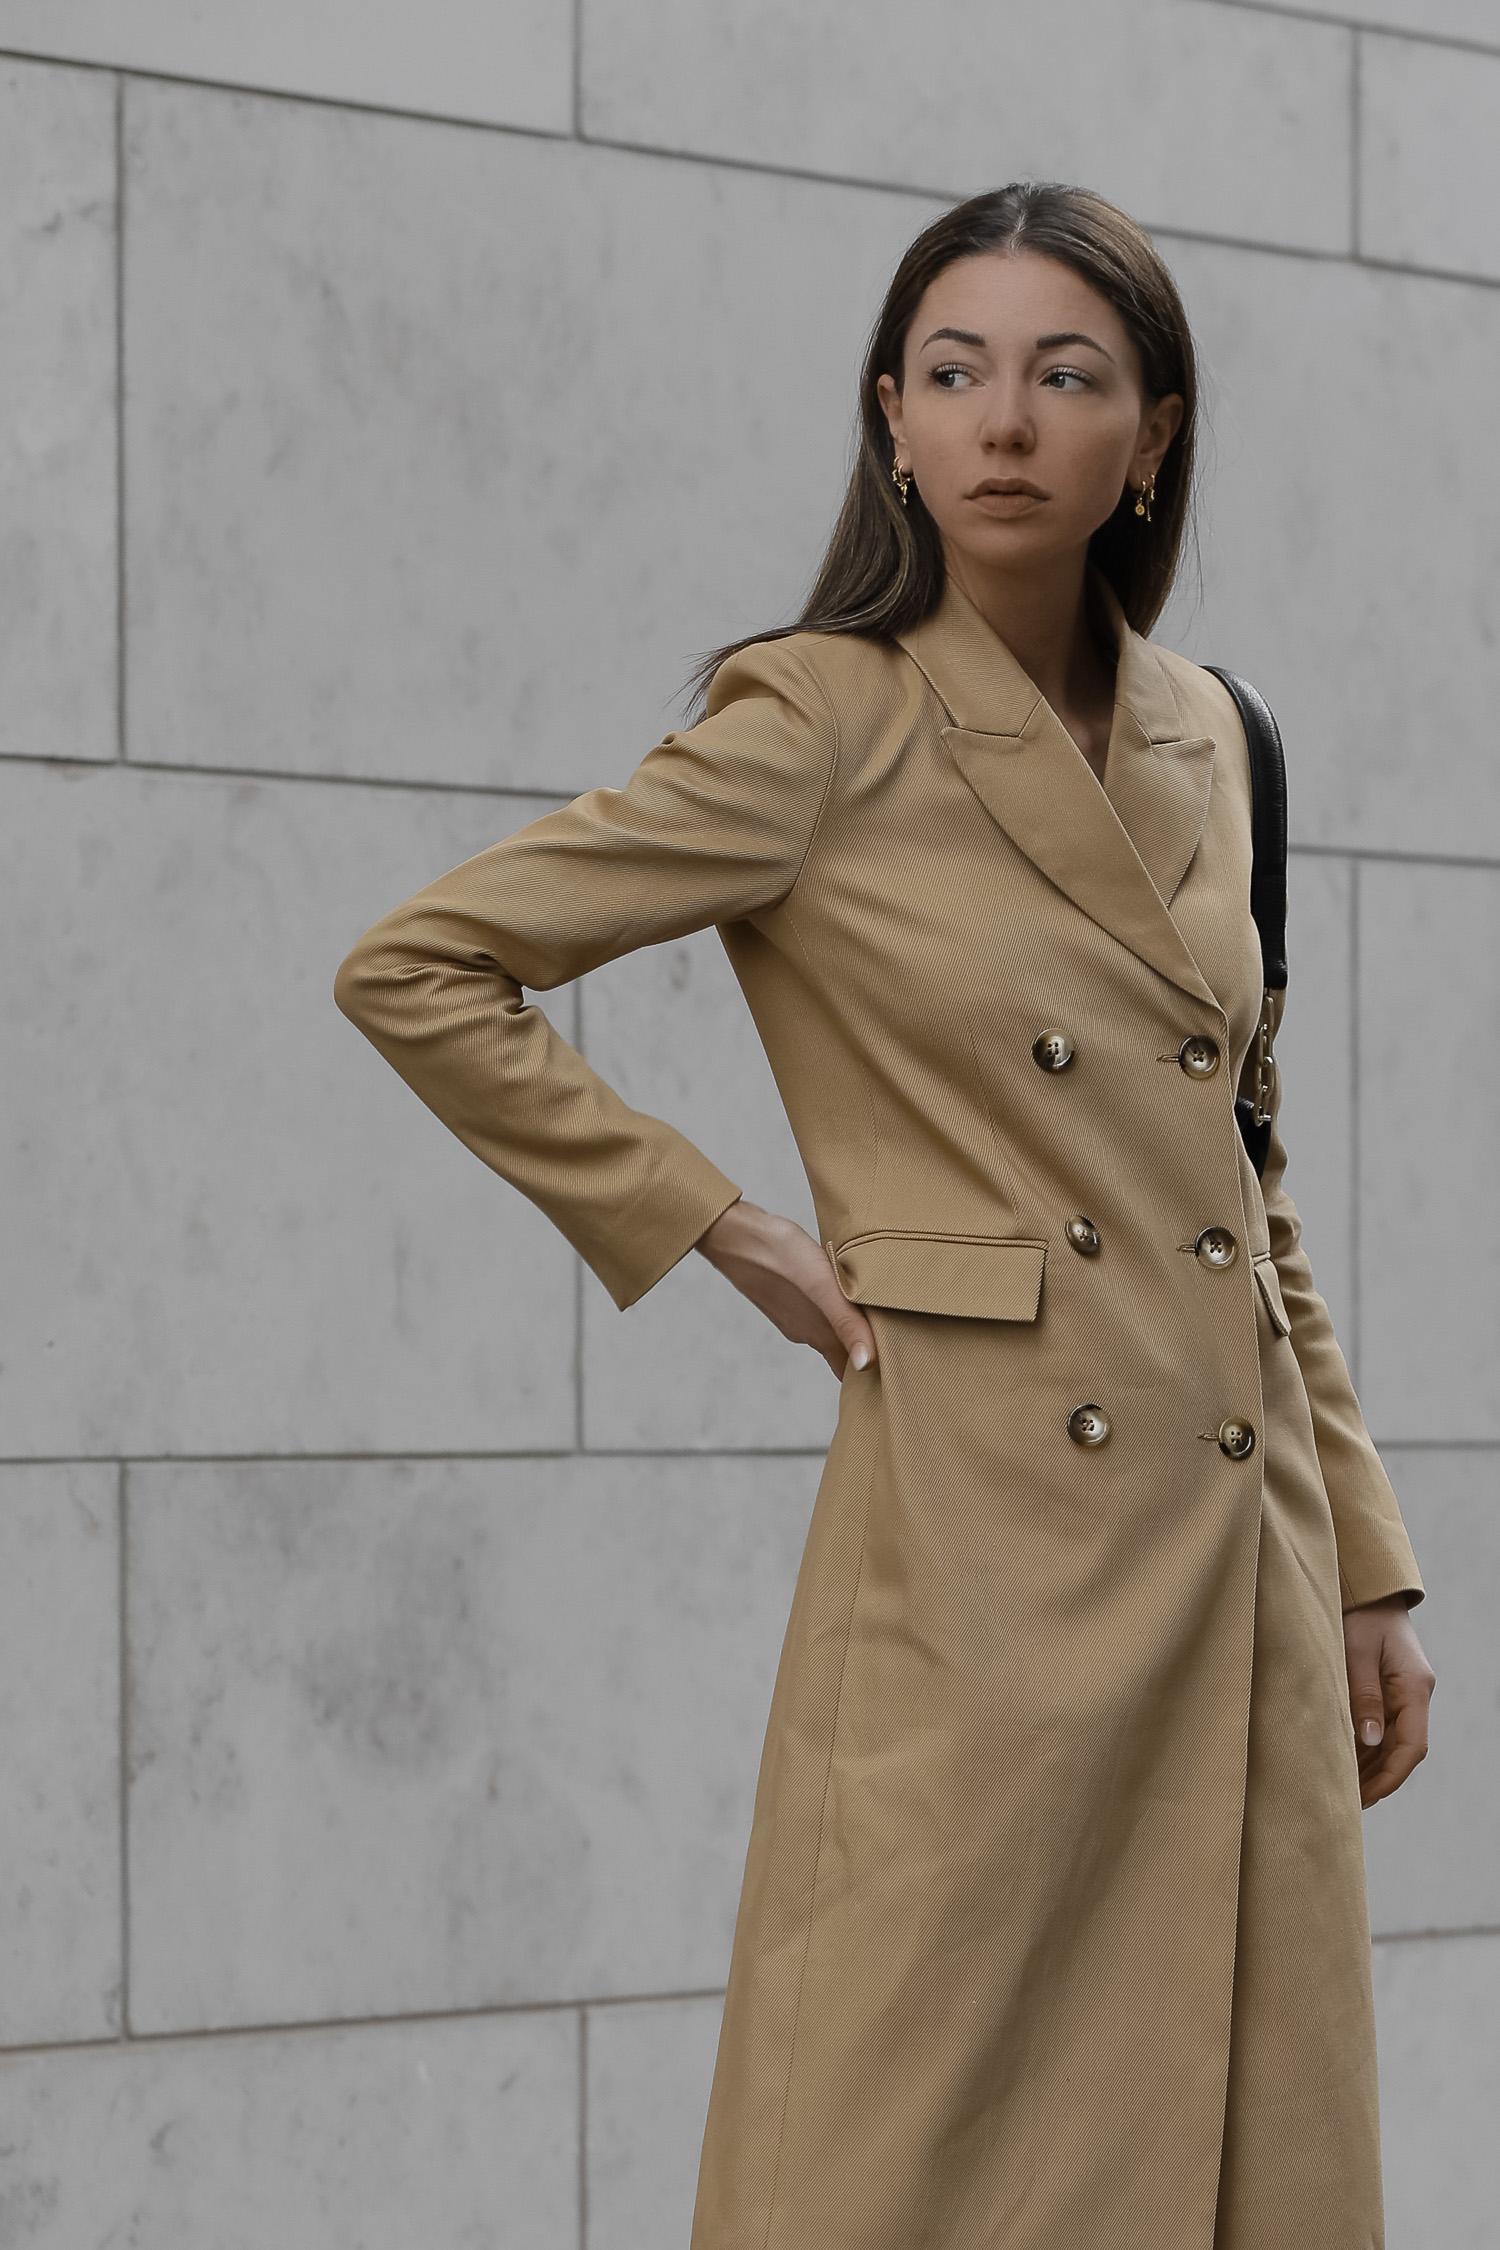 jasmin-kessler-modeblogger-2020-streetstyle-ivy-oak-mantel-zalandostyle-3